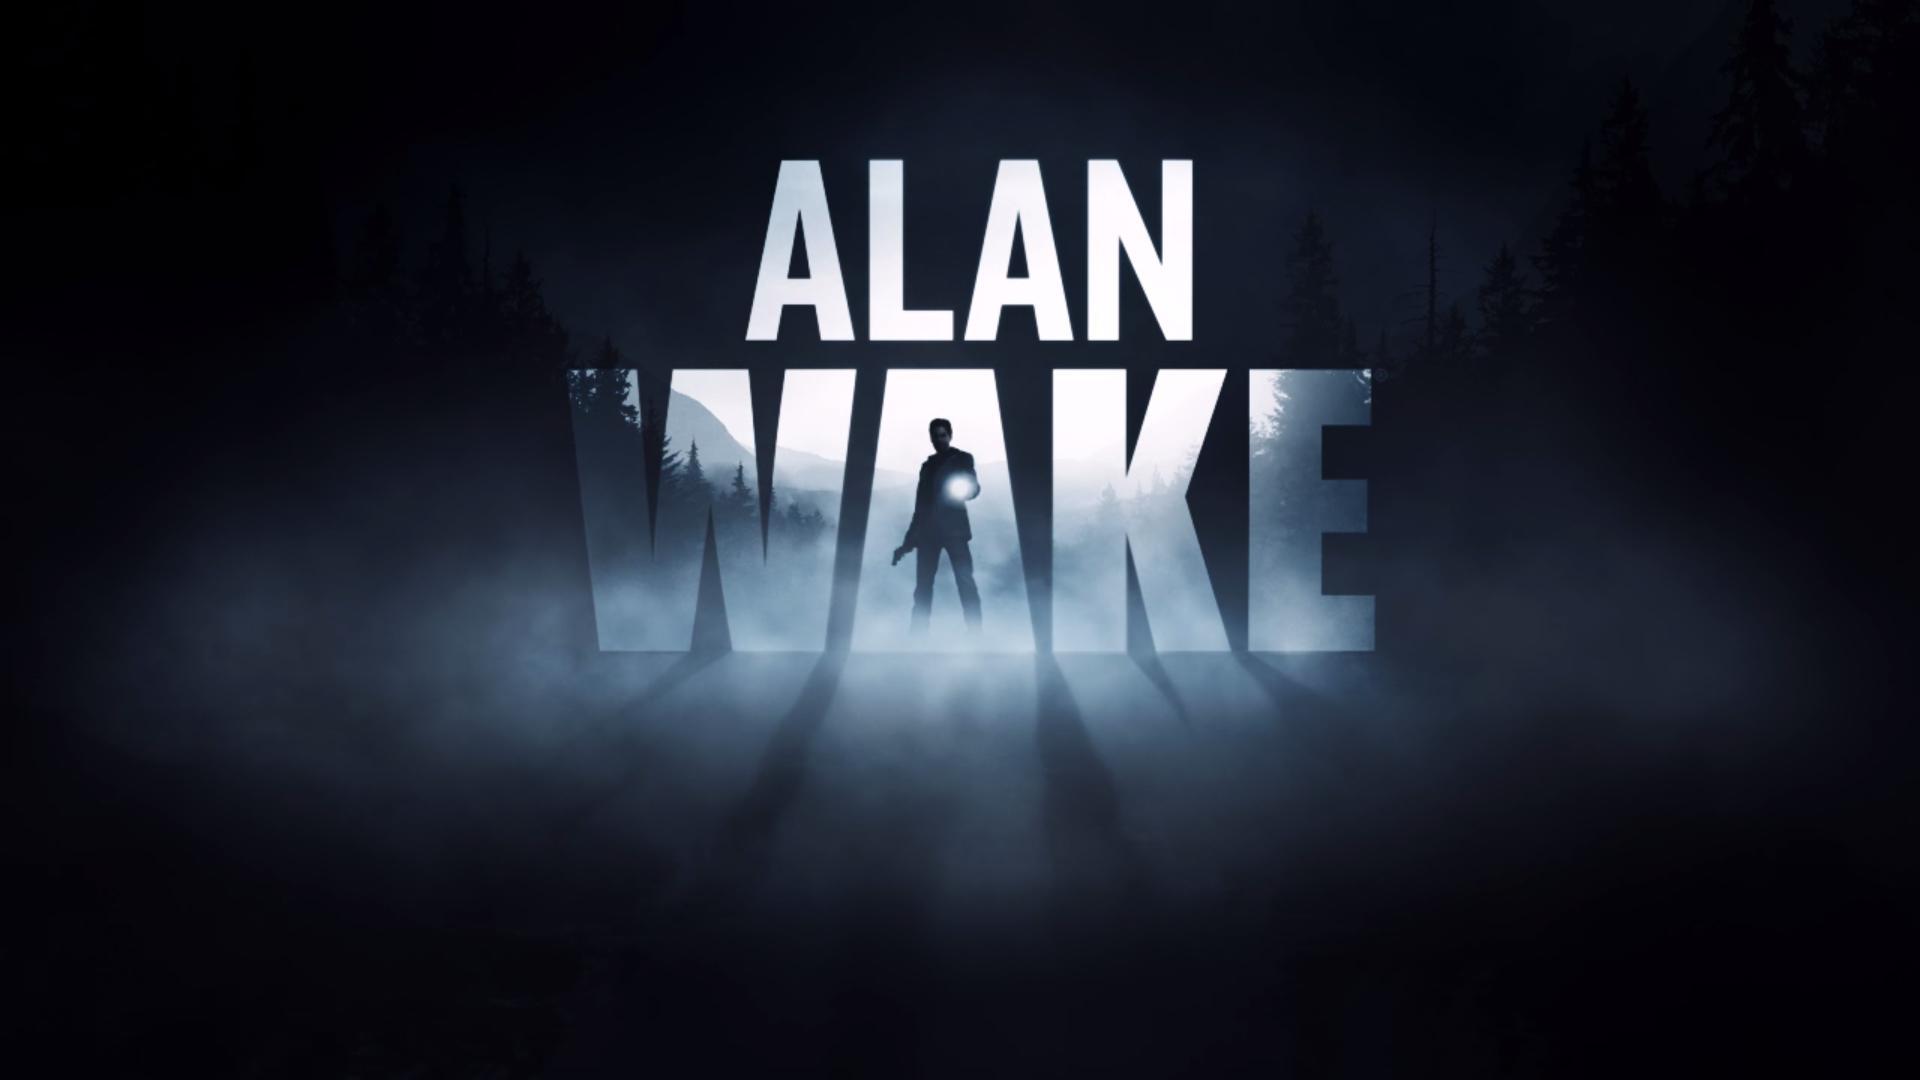 alan wake humble bundle feat